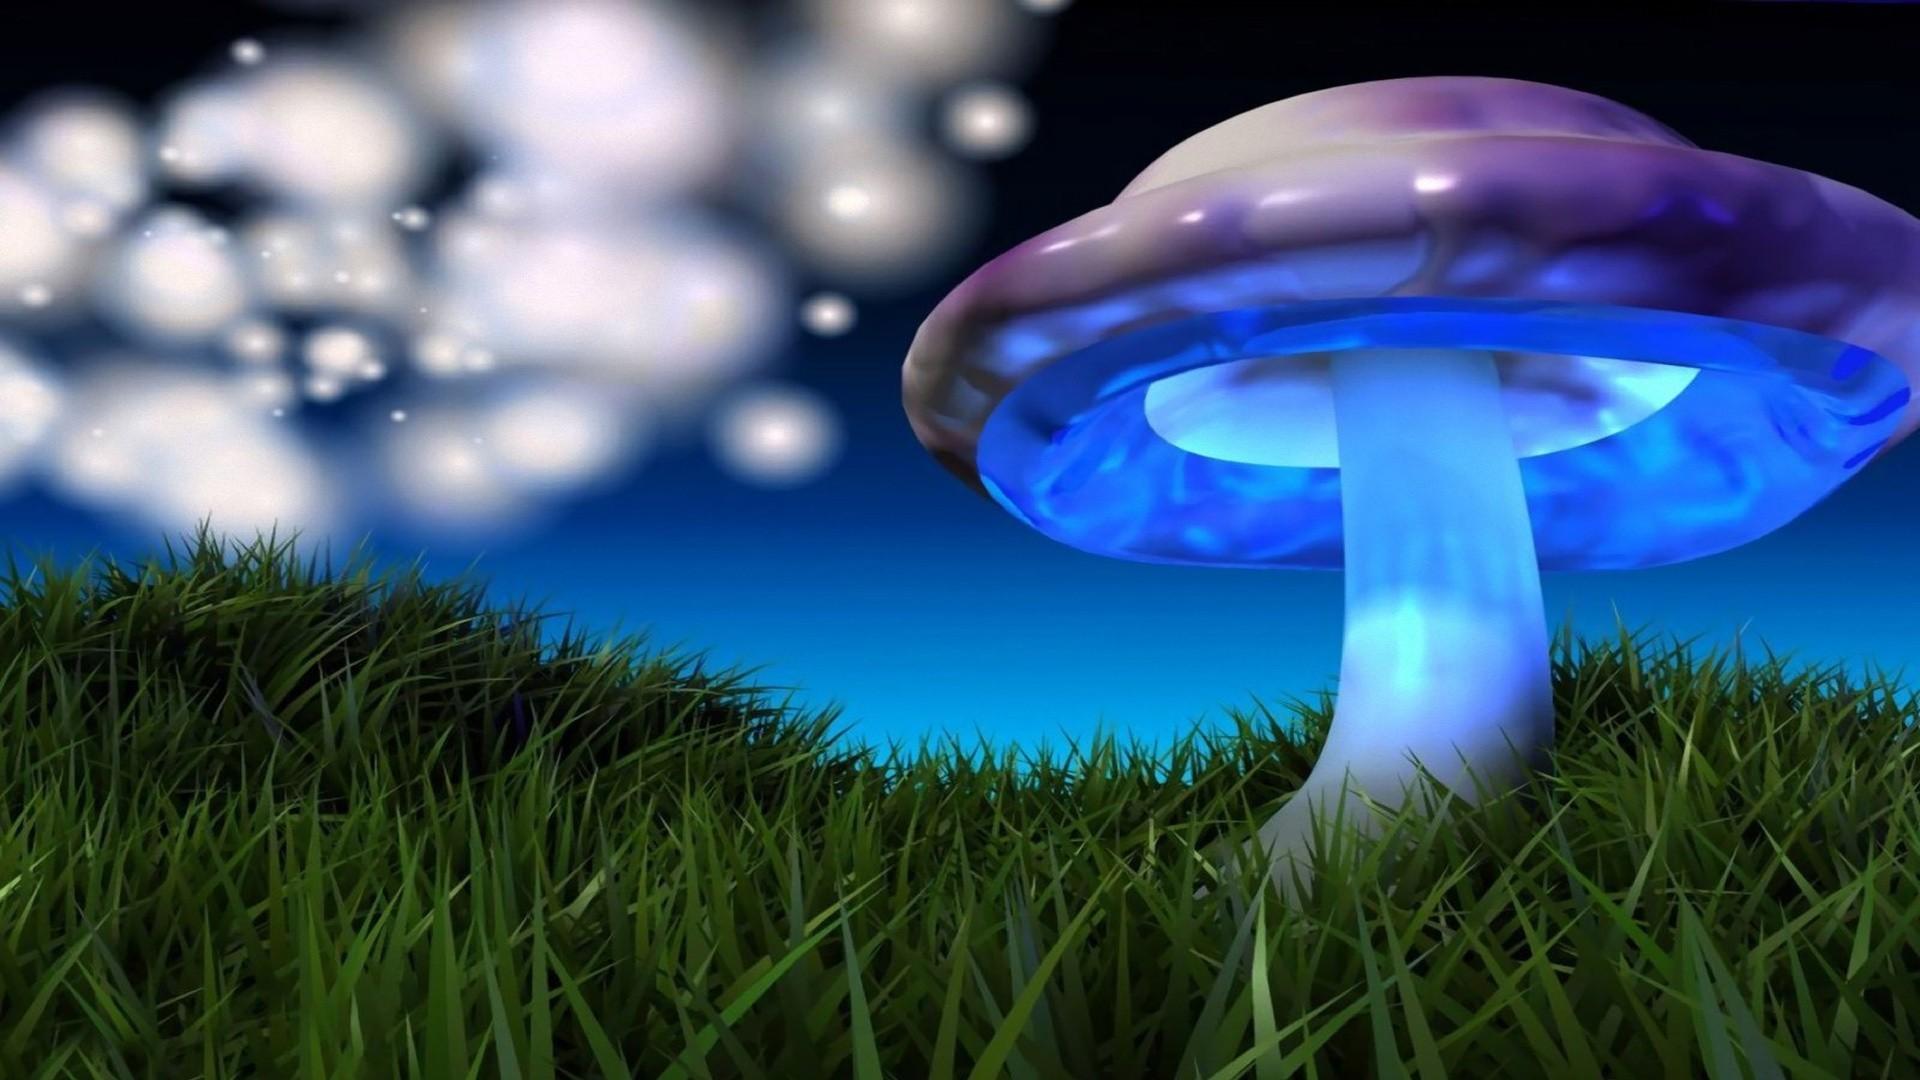 3D Mushroom Wallpaper (55+ Images